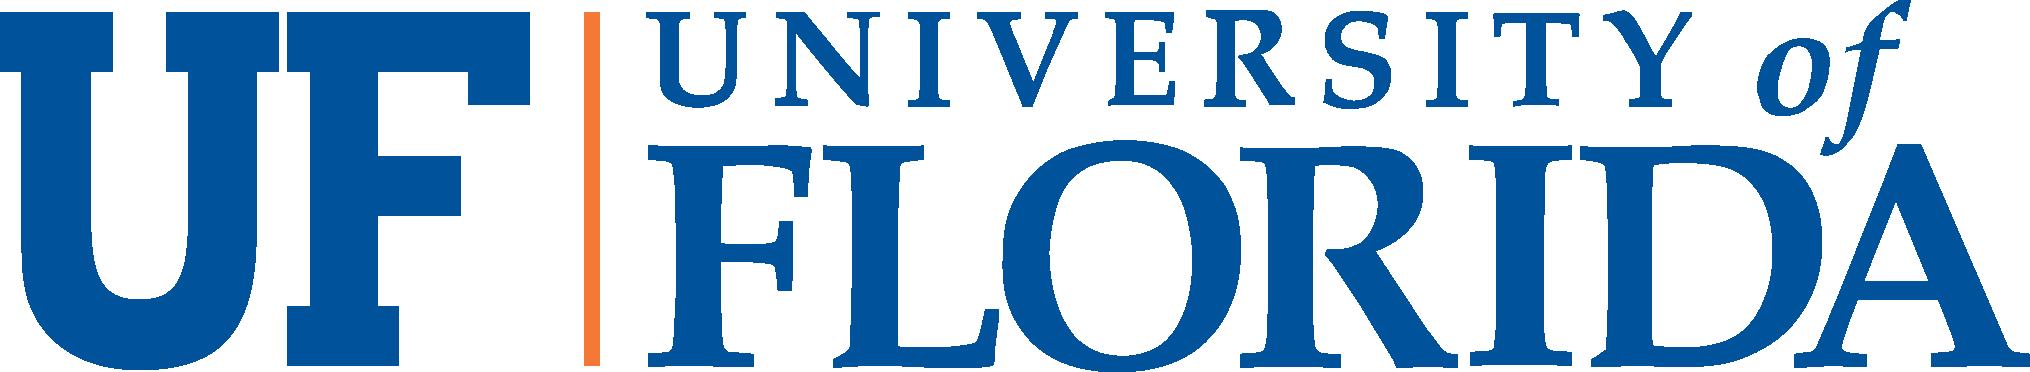 Univ of Florida.png